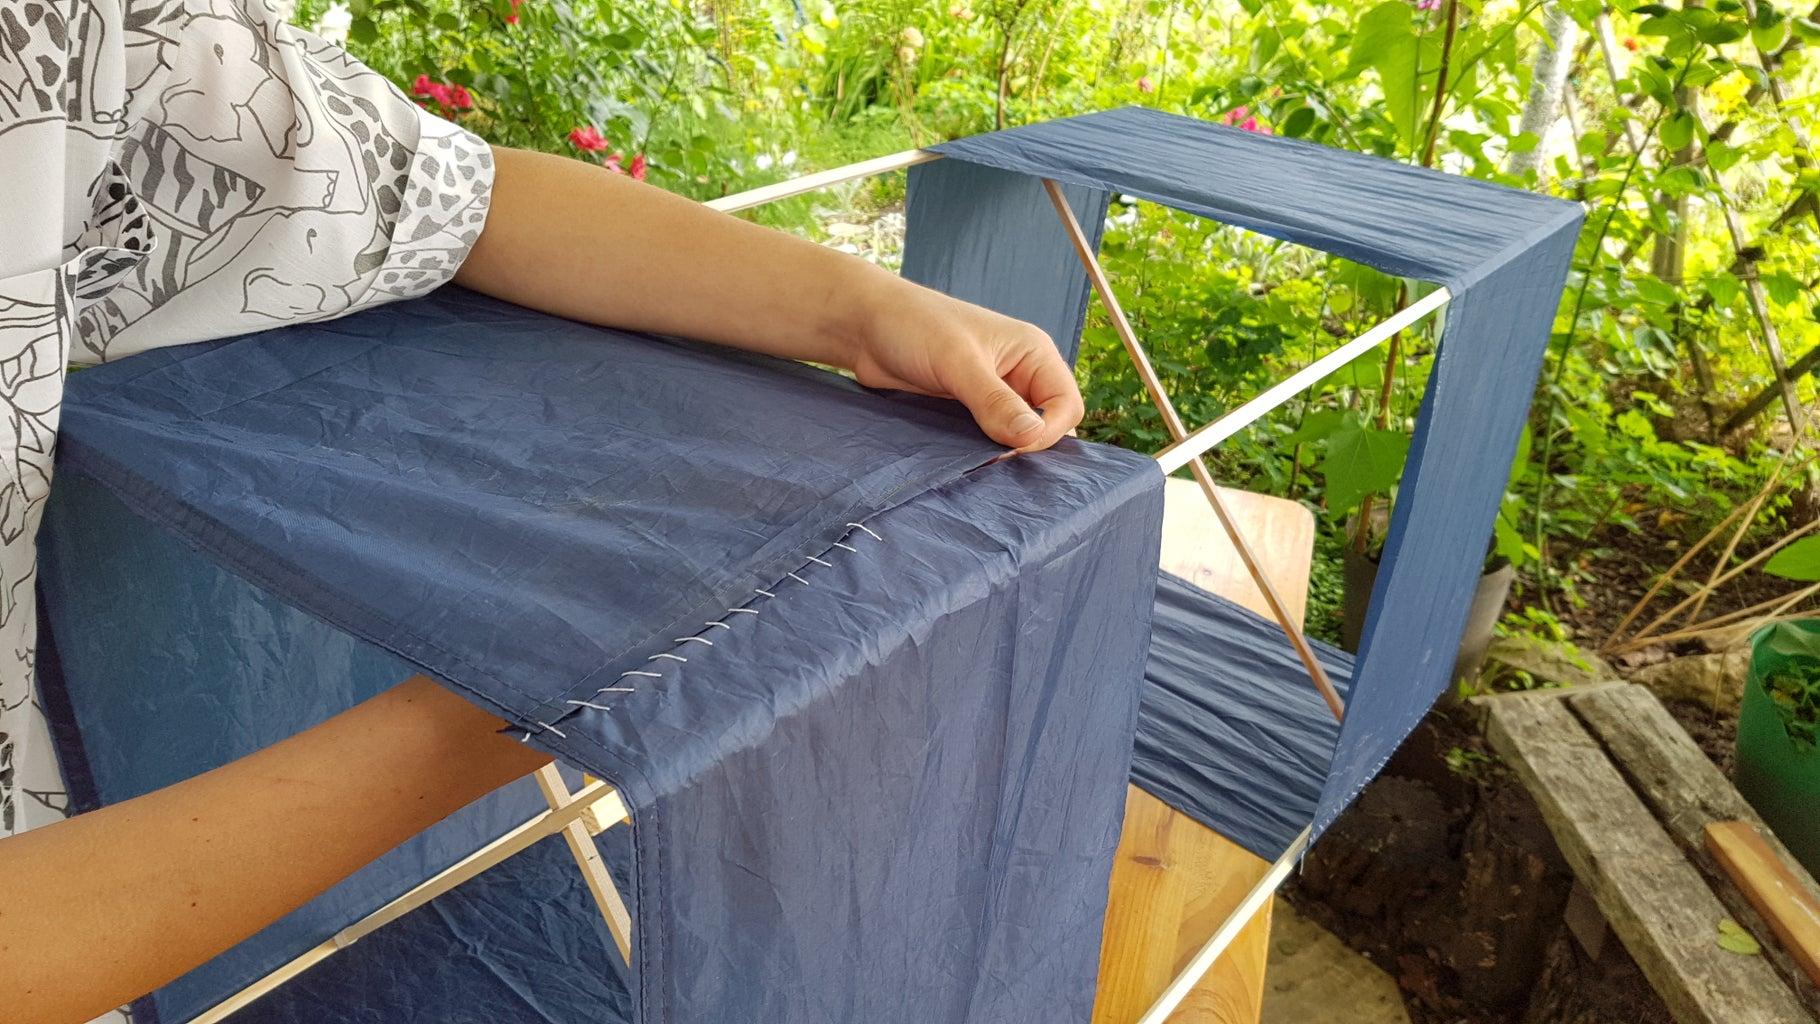 Stitch the Fabric Around the Frame